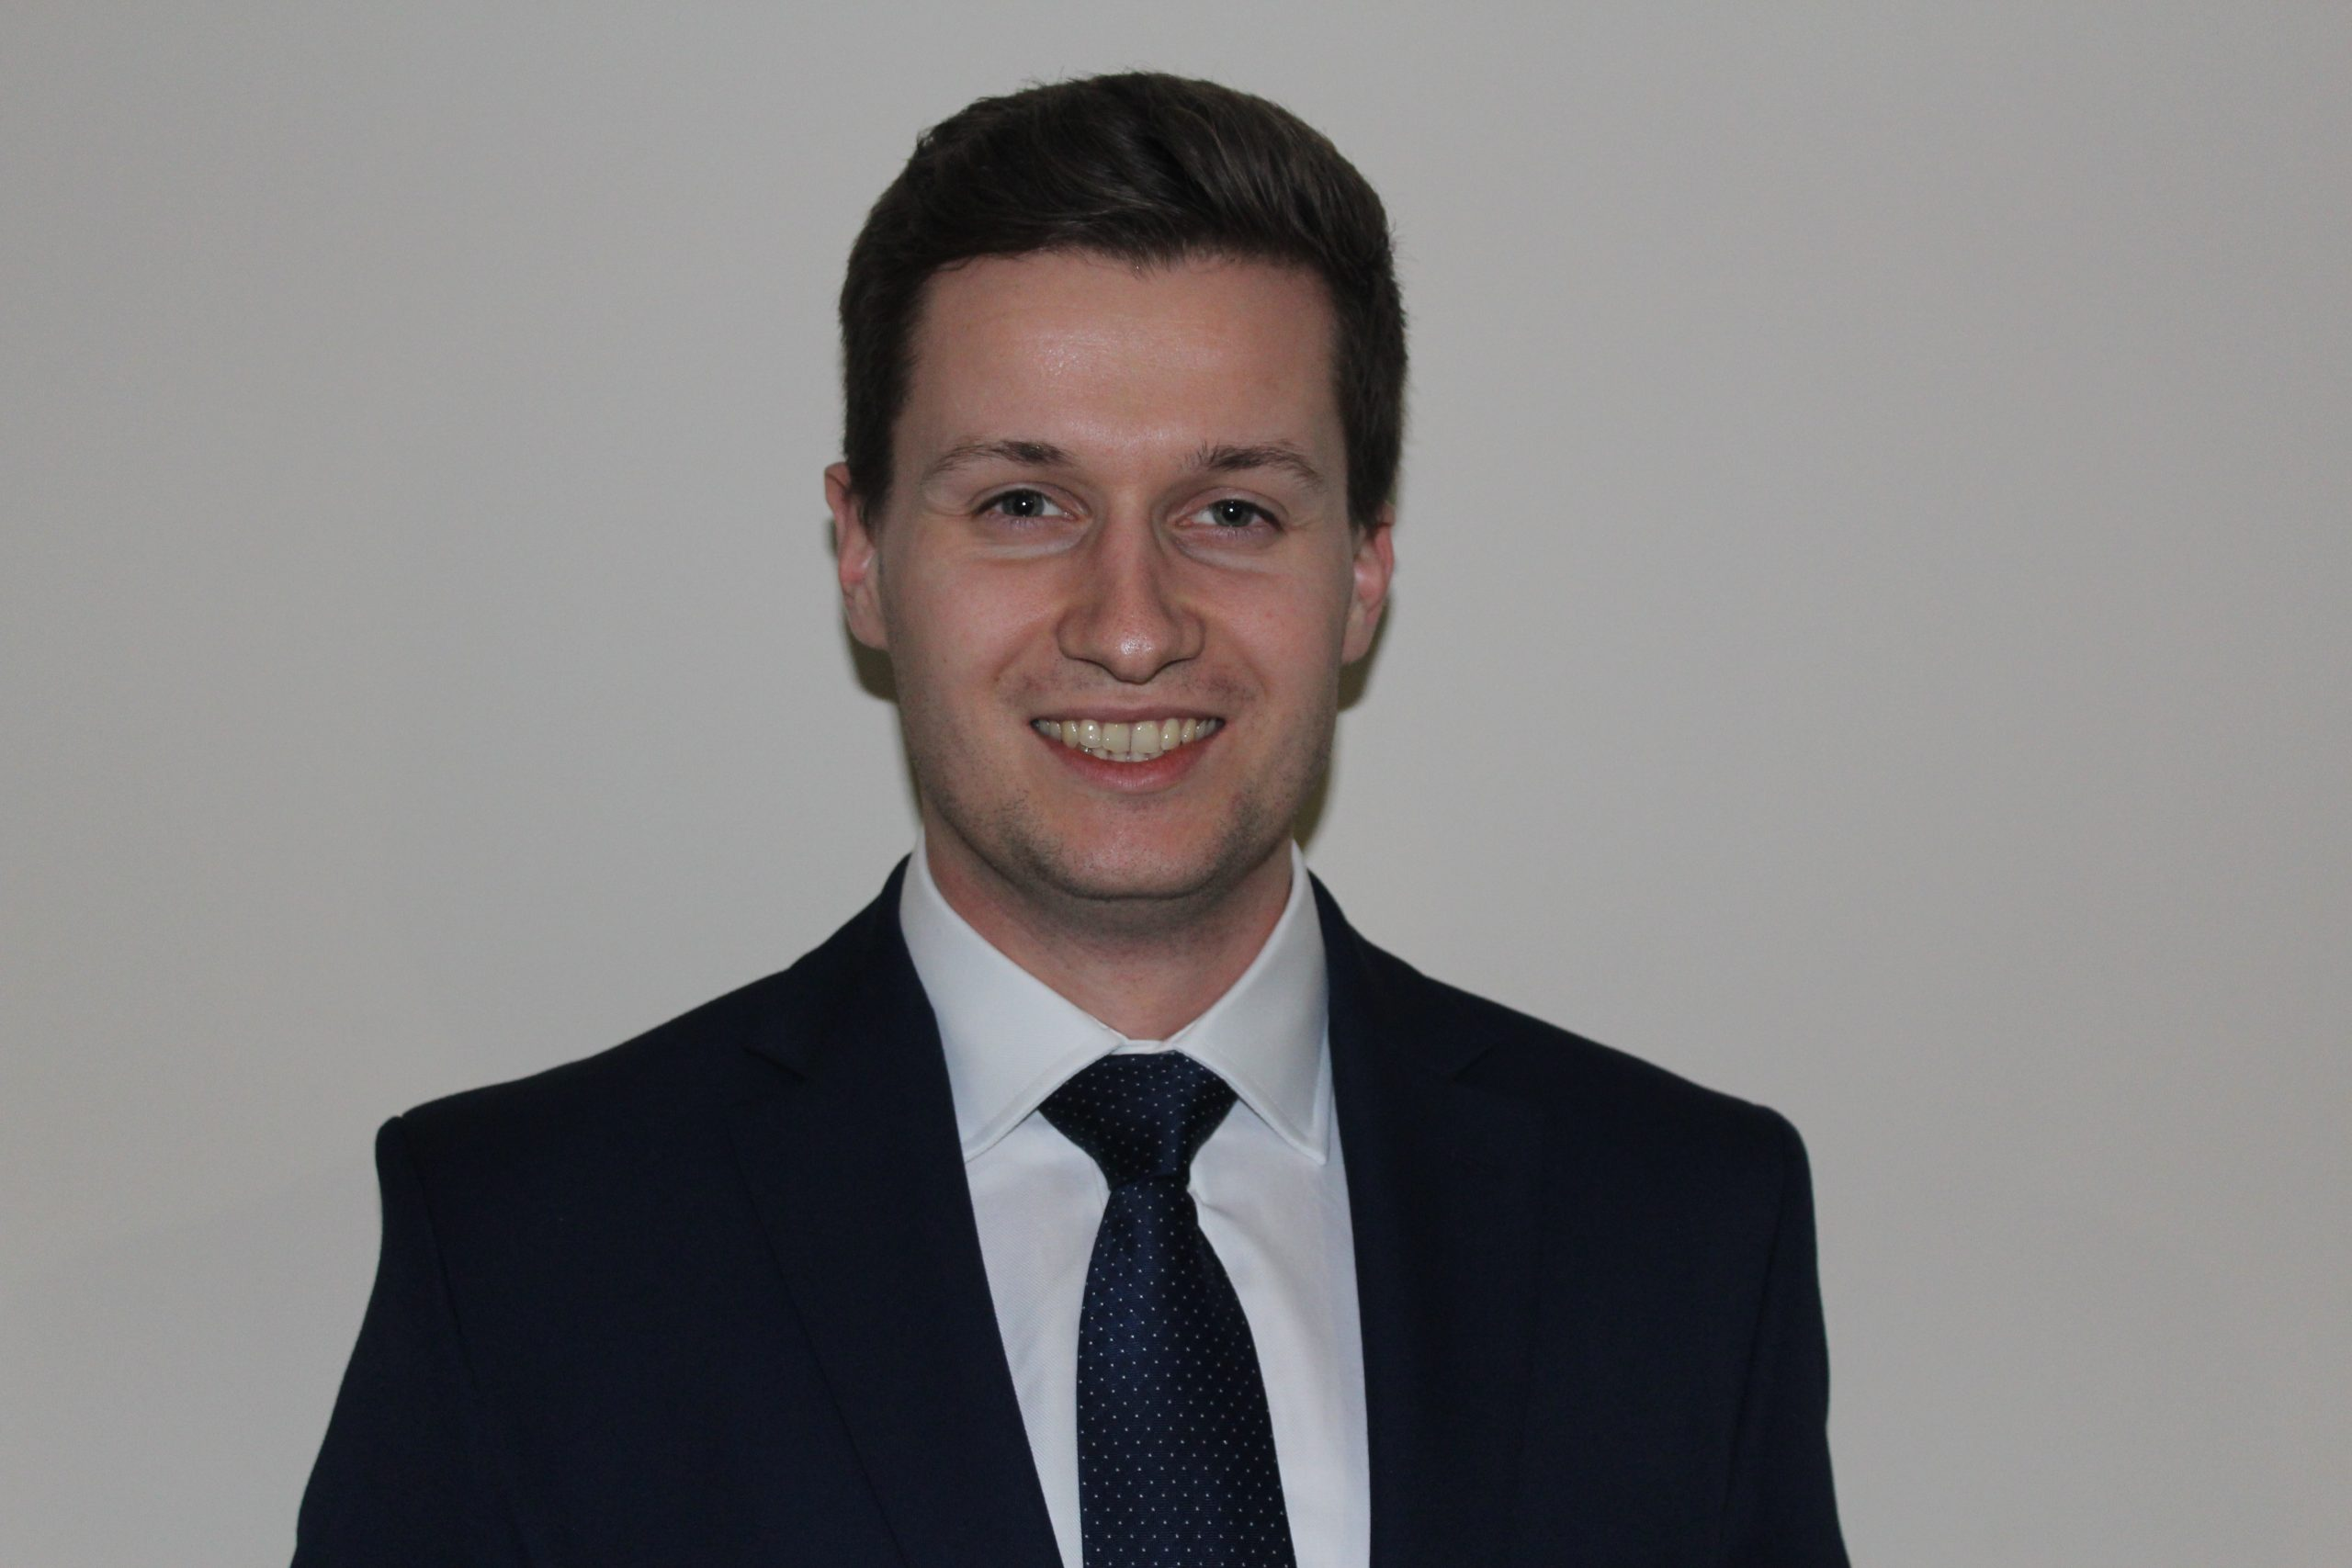 IWP UK – Meet The Adviser Series #1 Nathan Bater, Young IFA